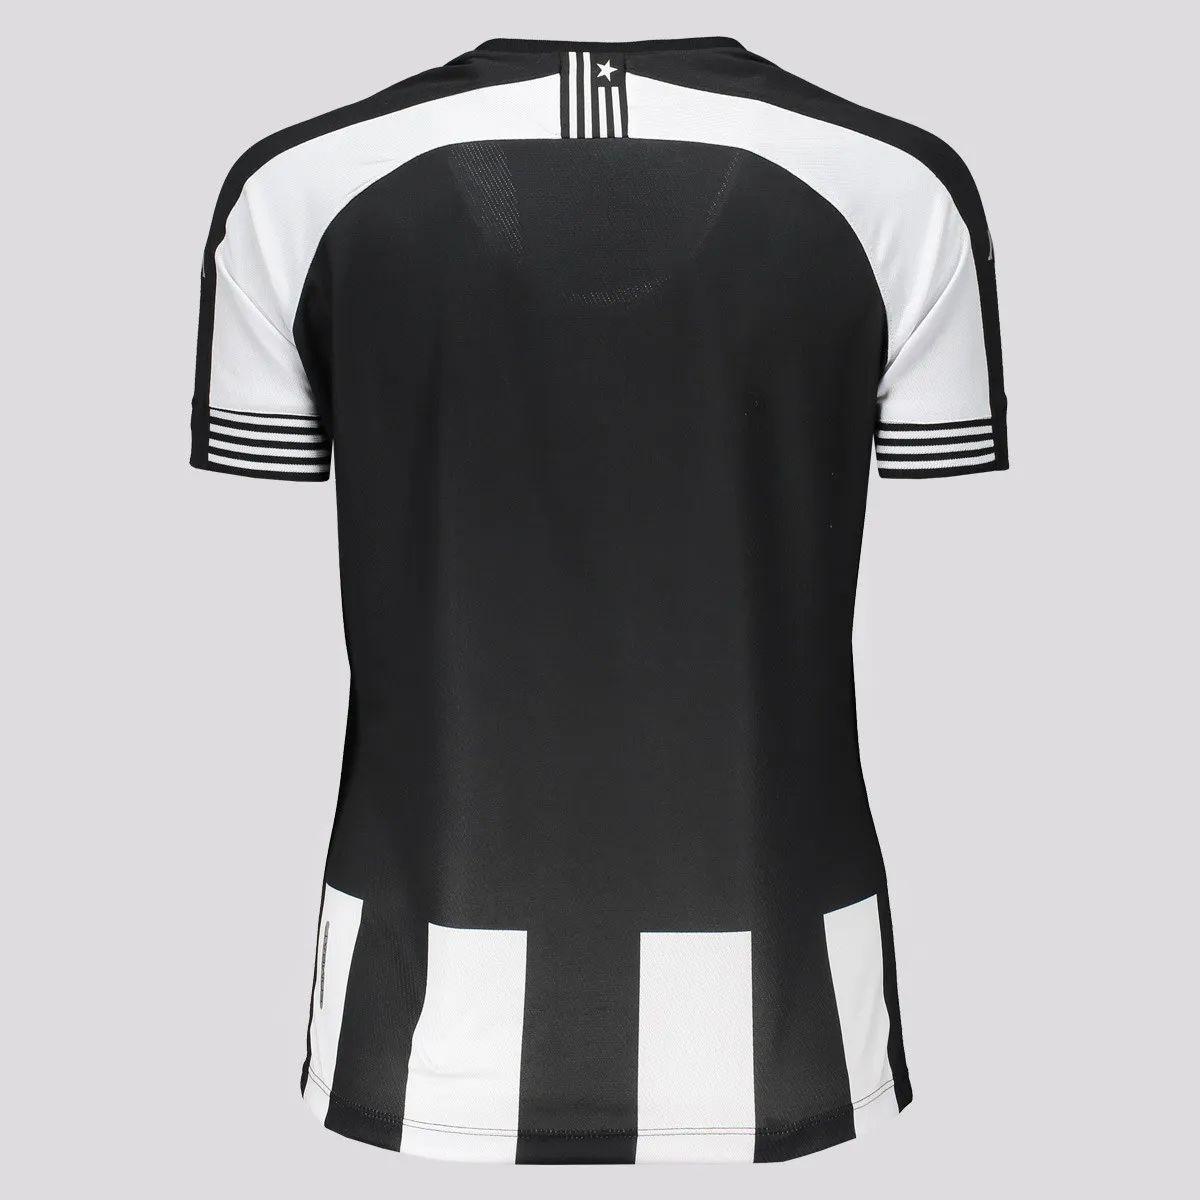 Camisa Kappa Botafogo I 2020 Feminina